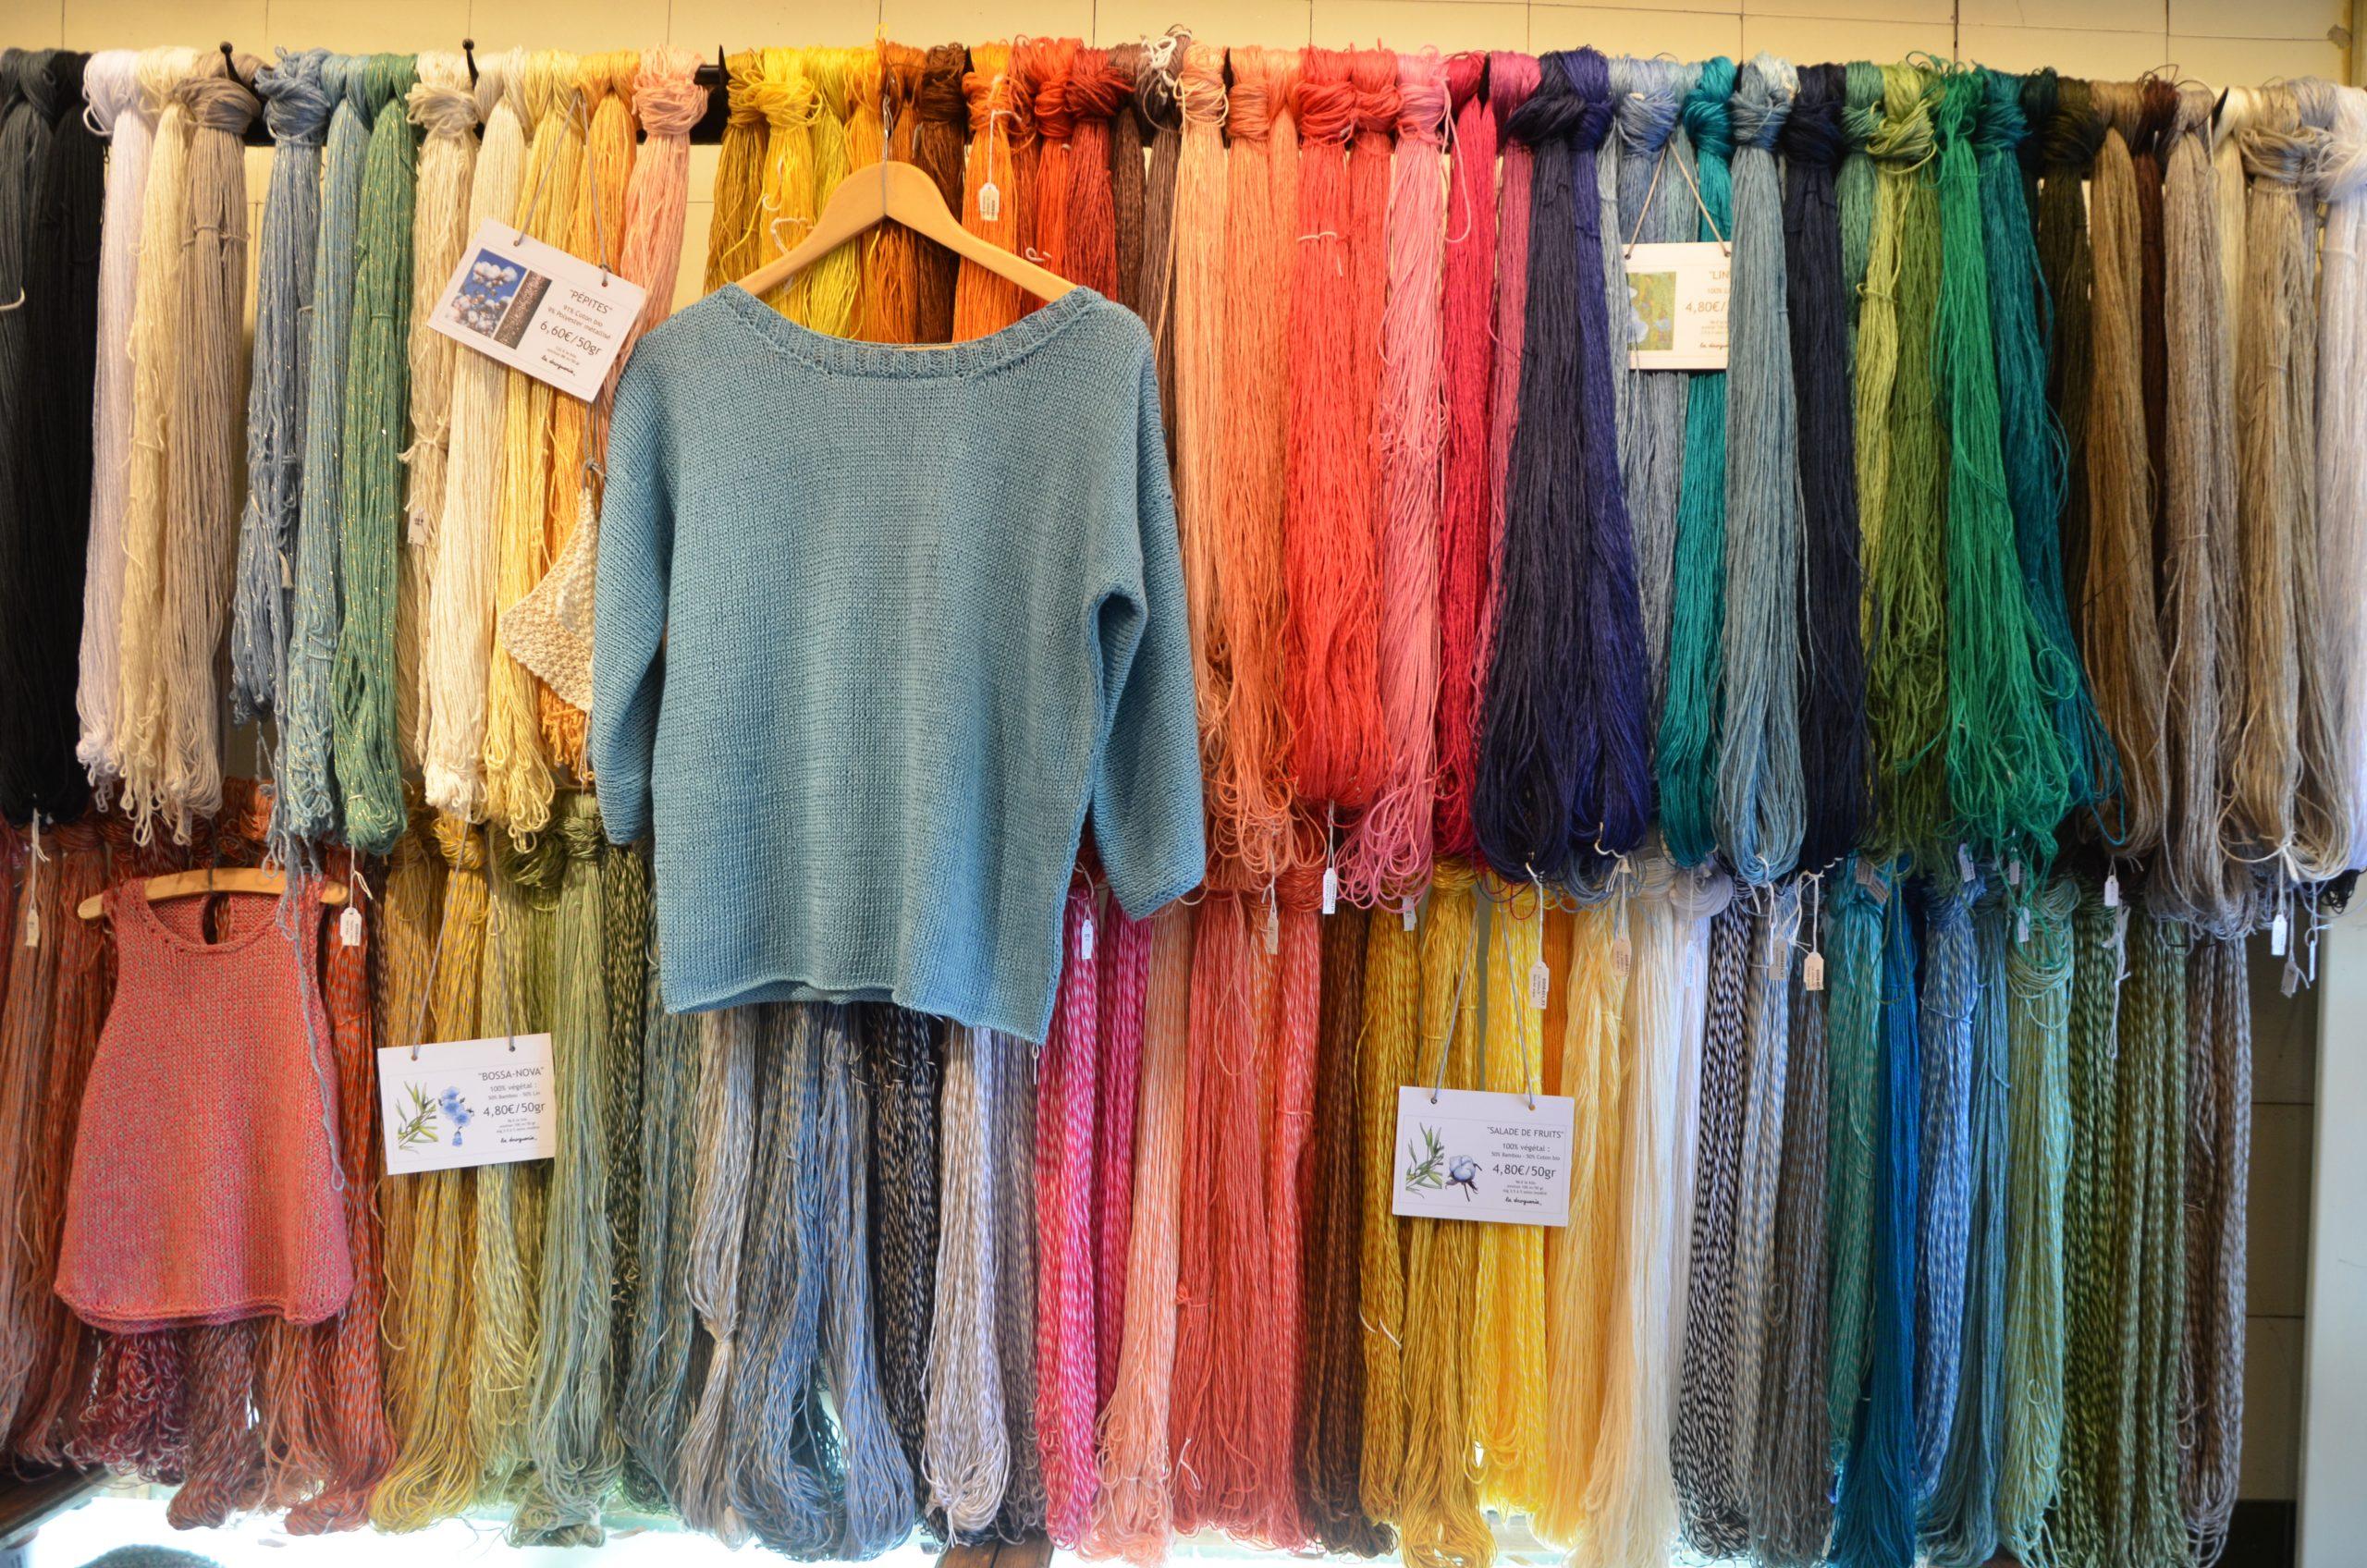 best website 6161c 32a05 Yarn Shops in France - Nice, Grenoble, Colmar, Strasbourg ...